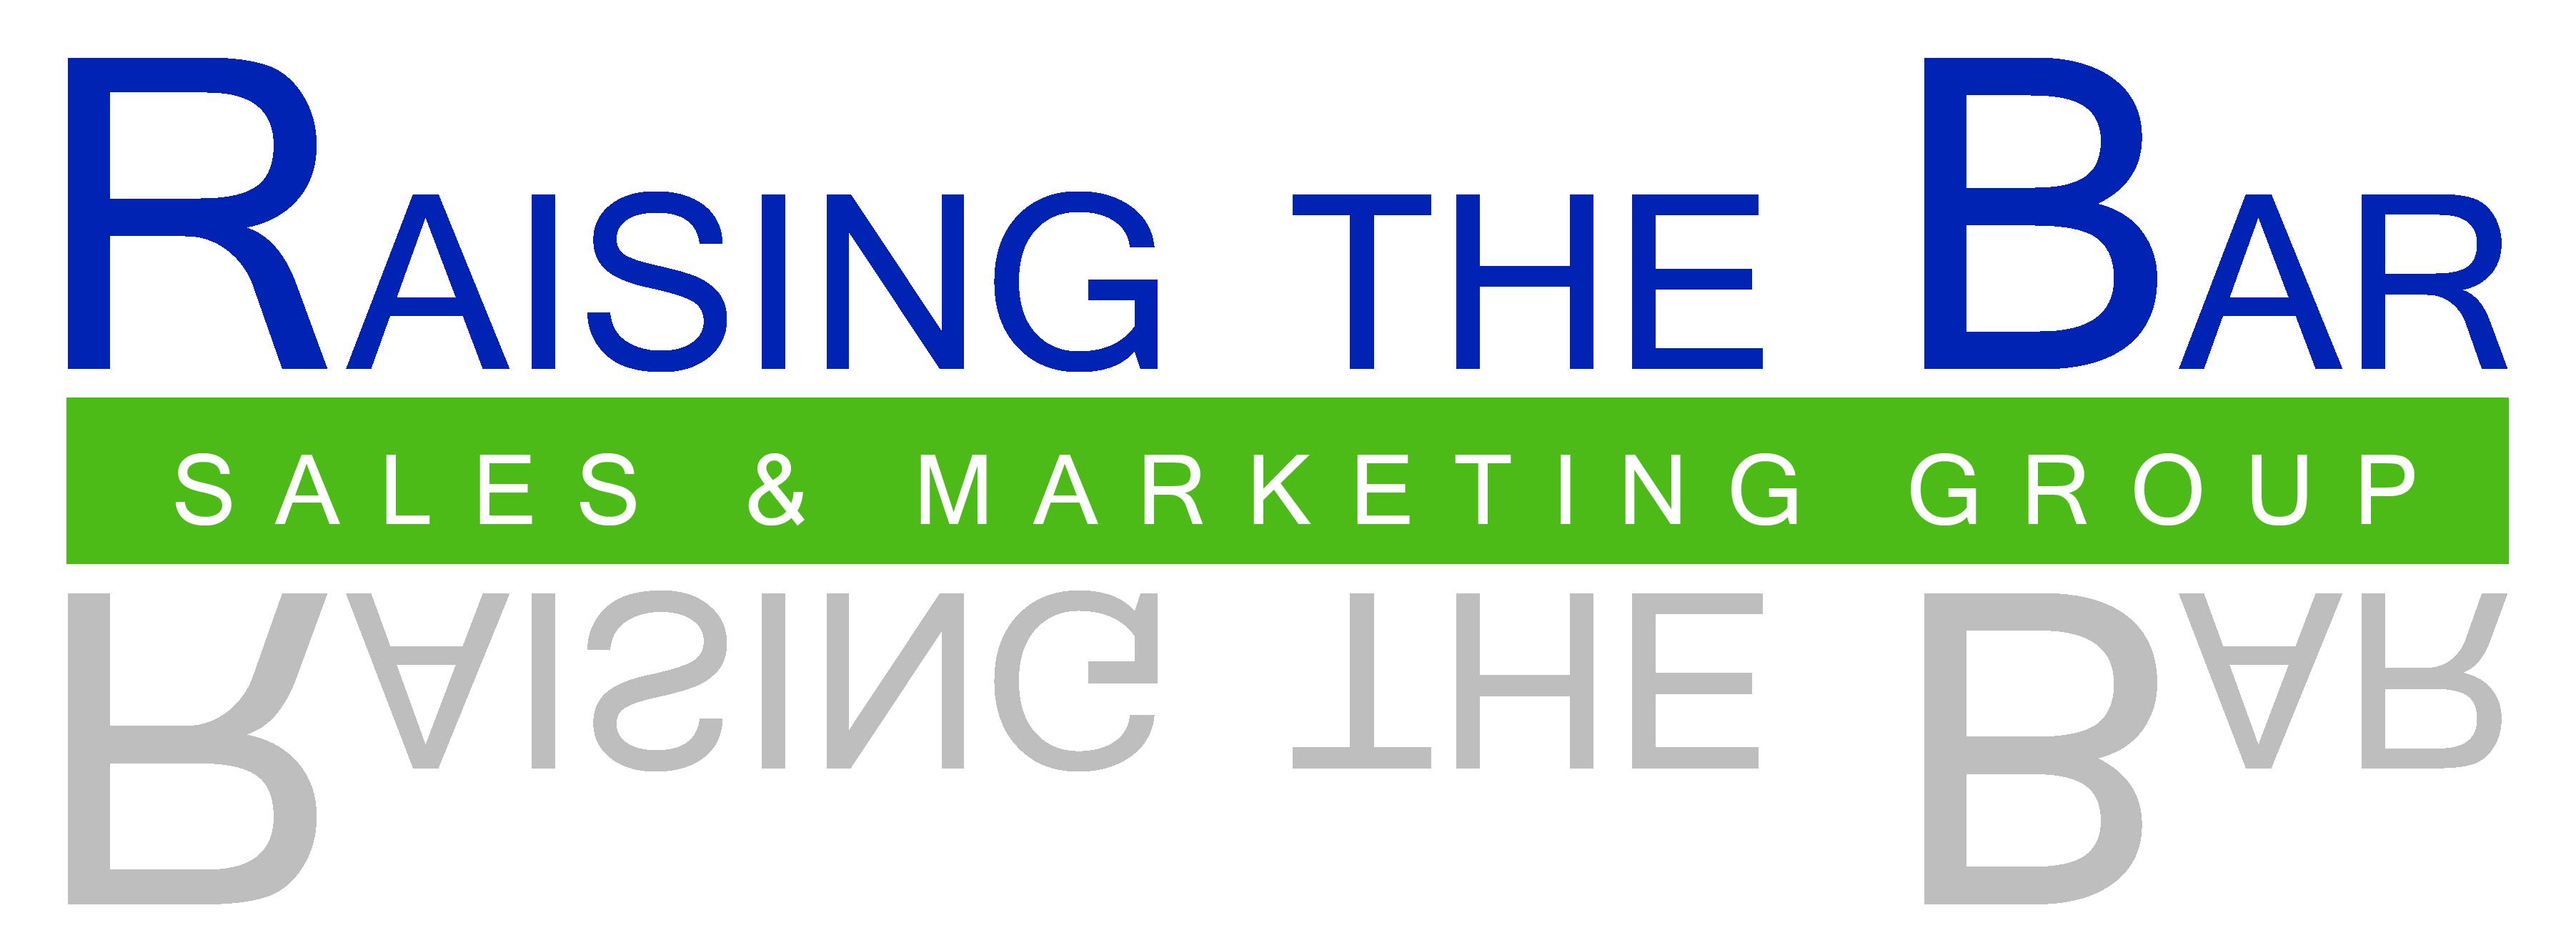 Raising the Bar Marketing